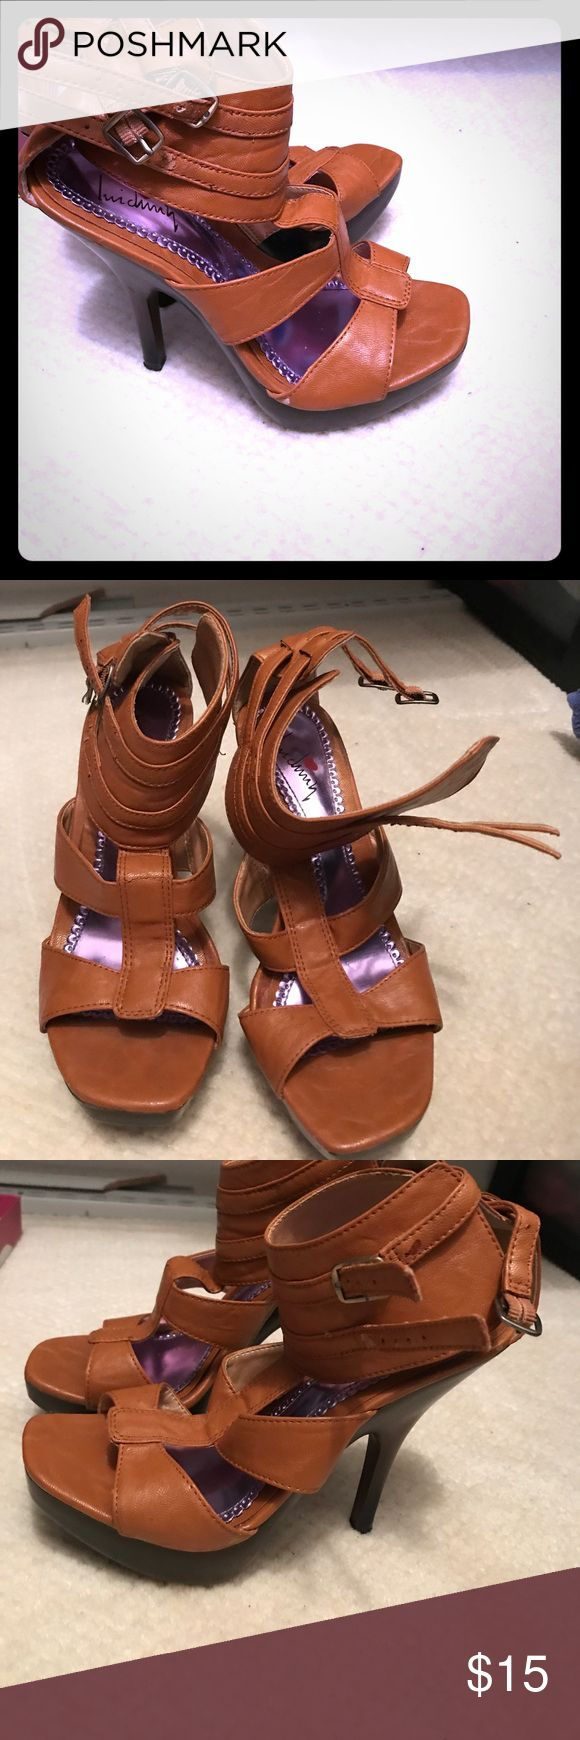 Brown strappy heel Dark/brown high heel sandal Luichiny Shoes Heels